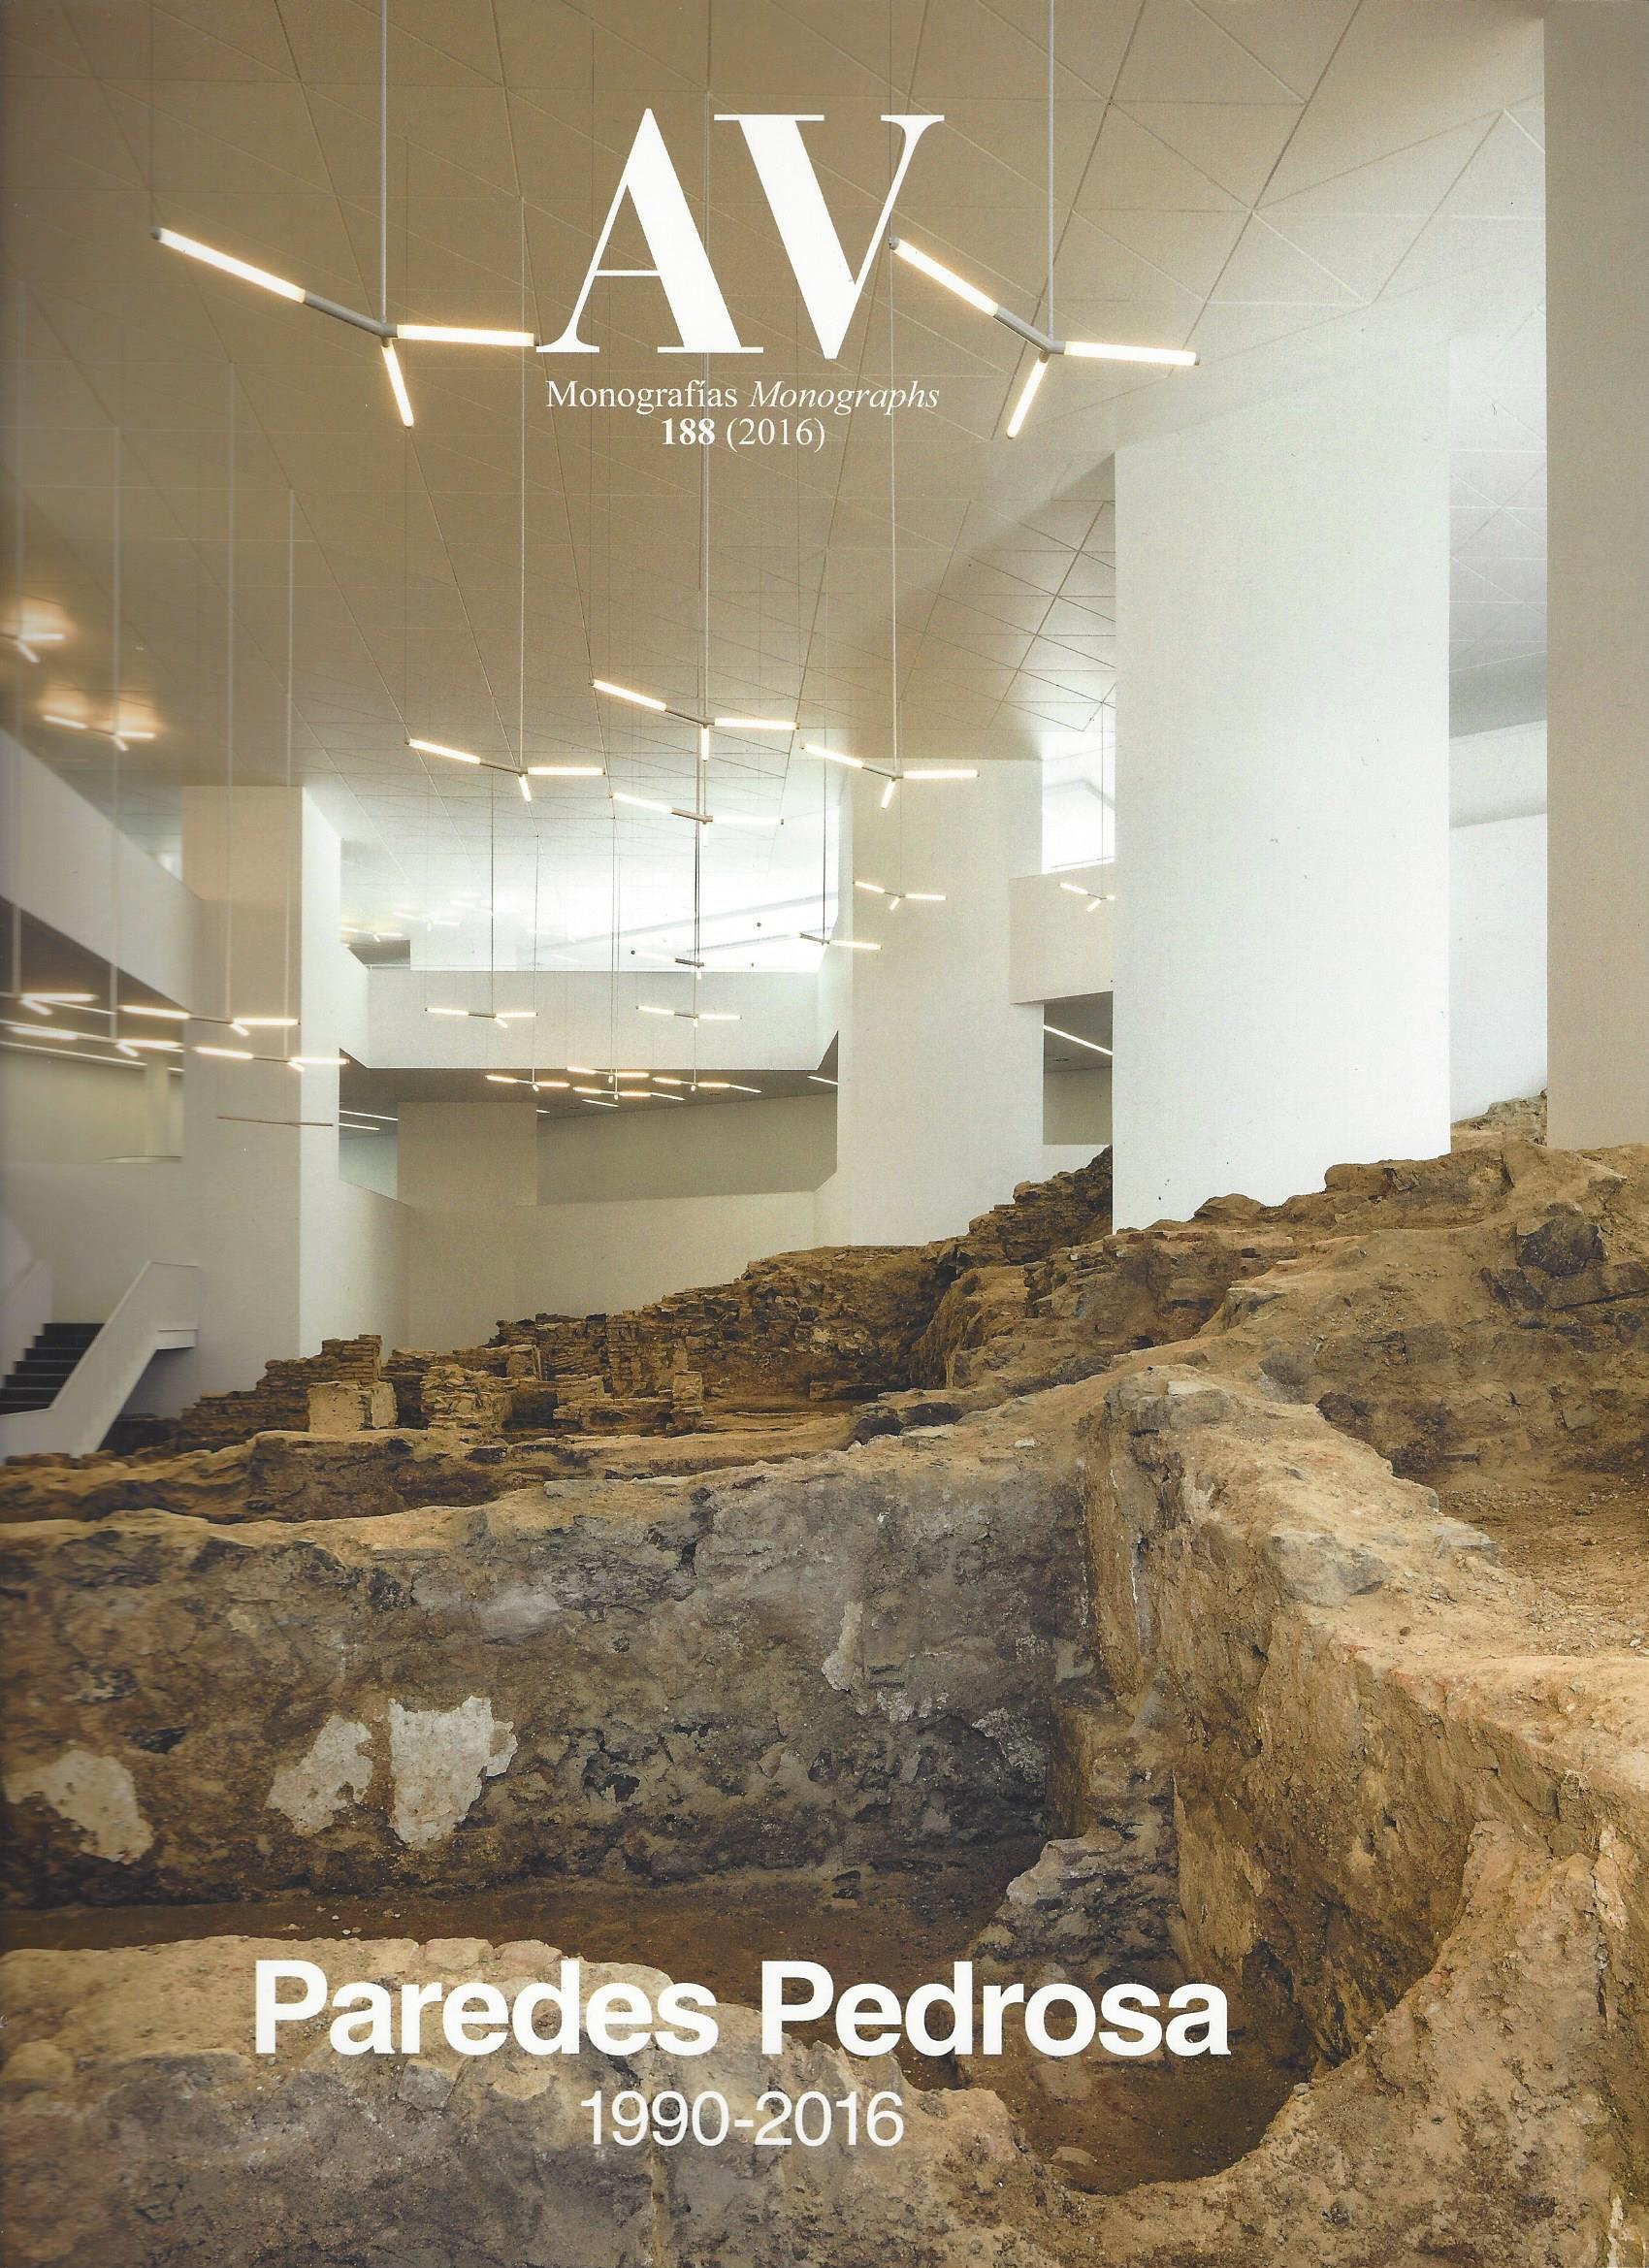 AV Monografías (Madrid) / NA 5 A85 NO 188 2016